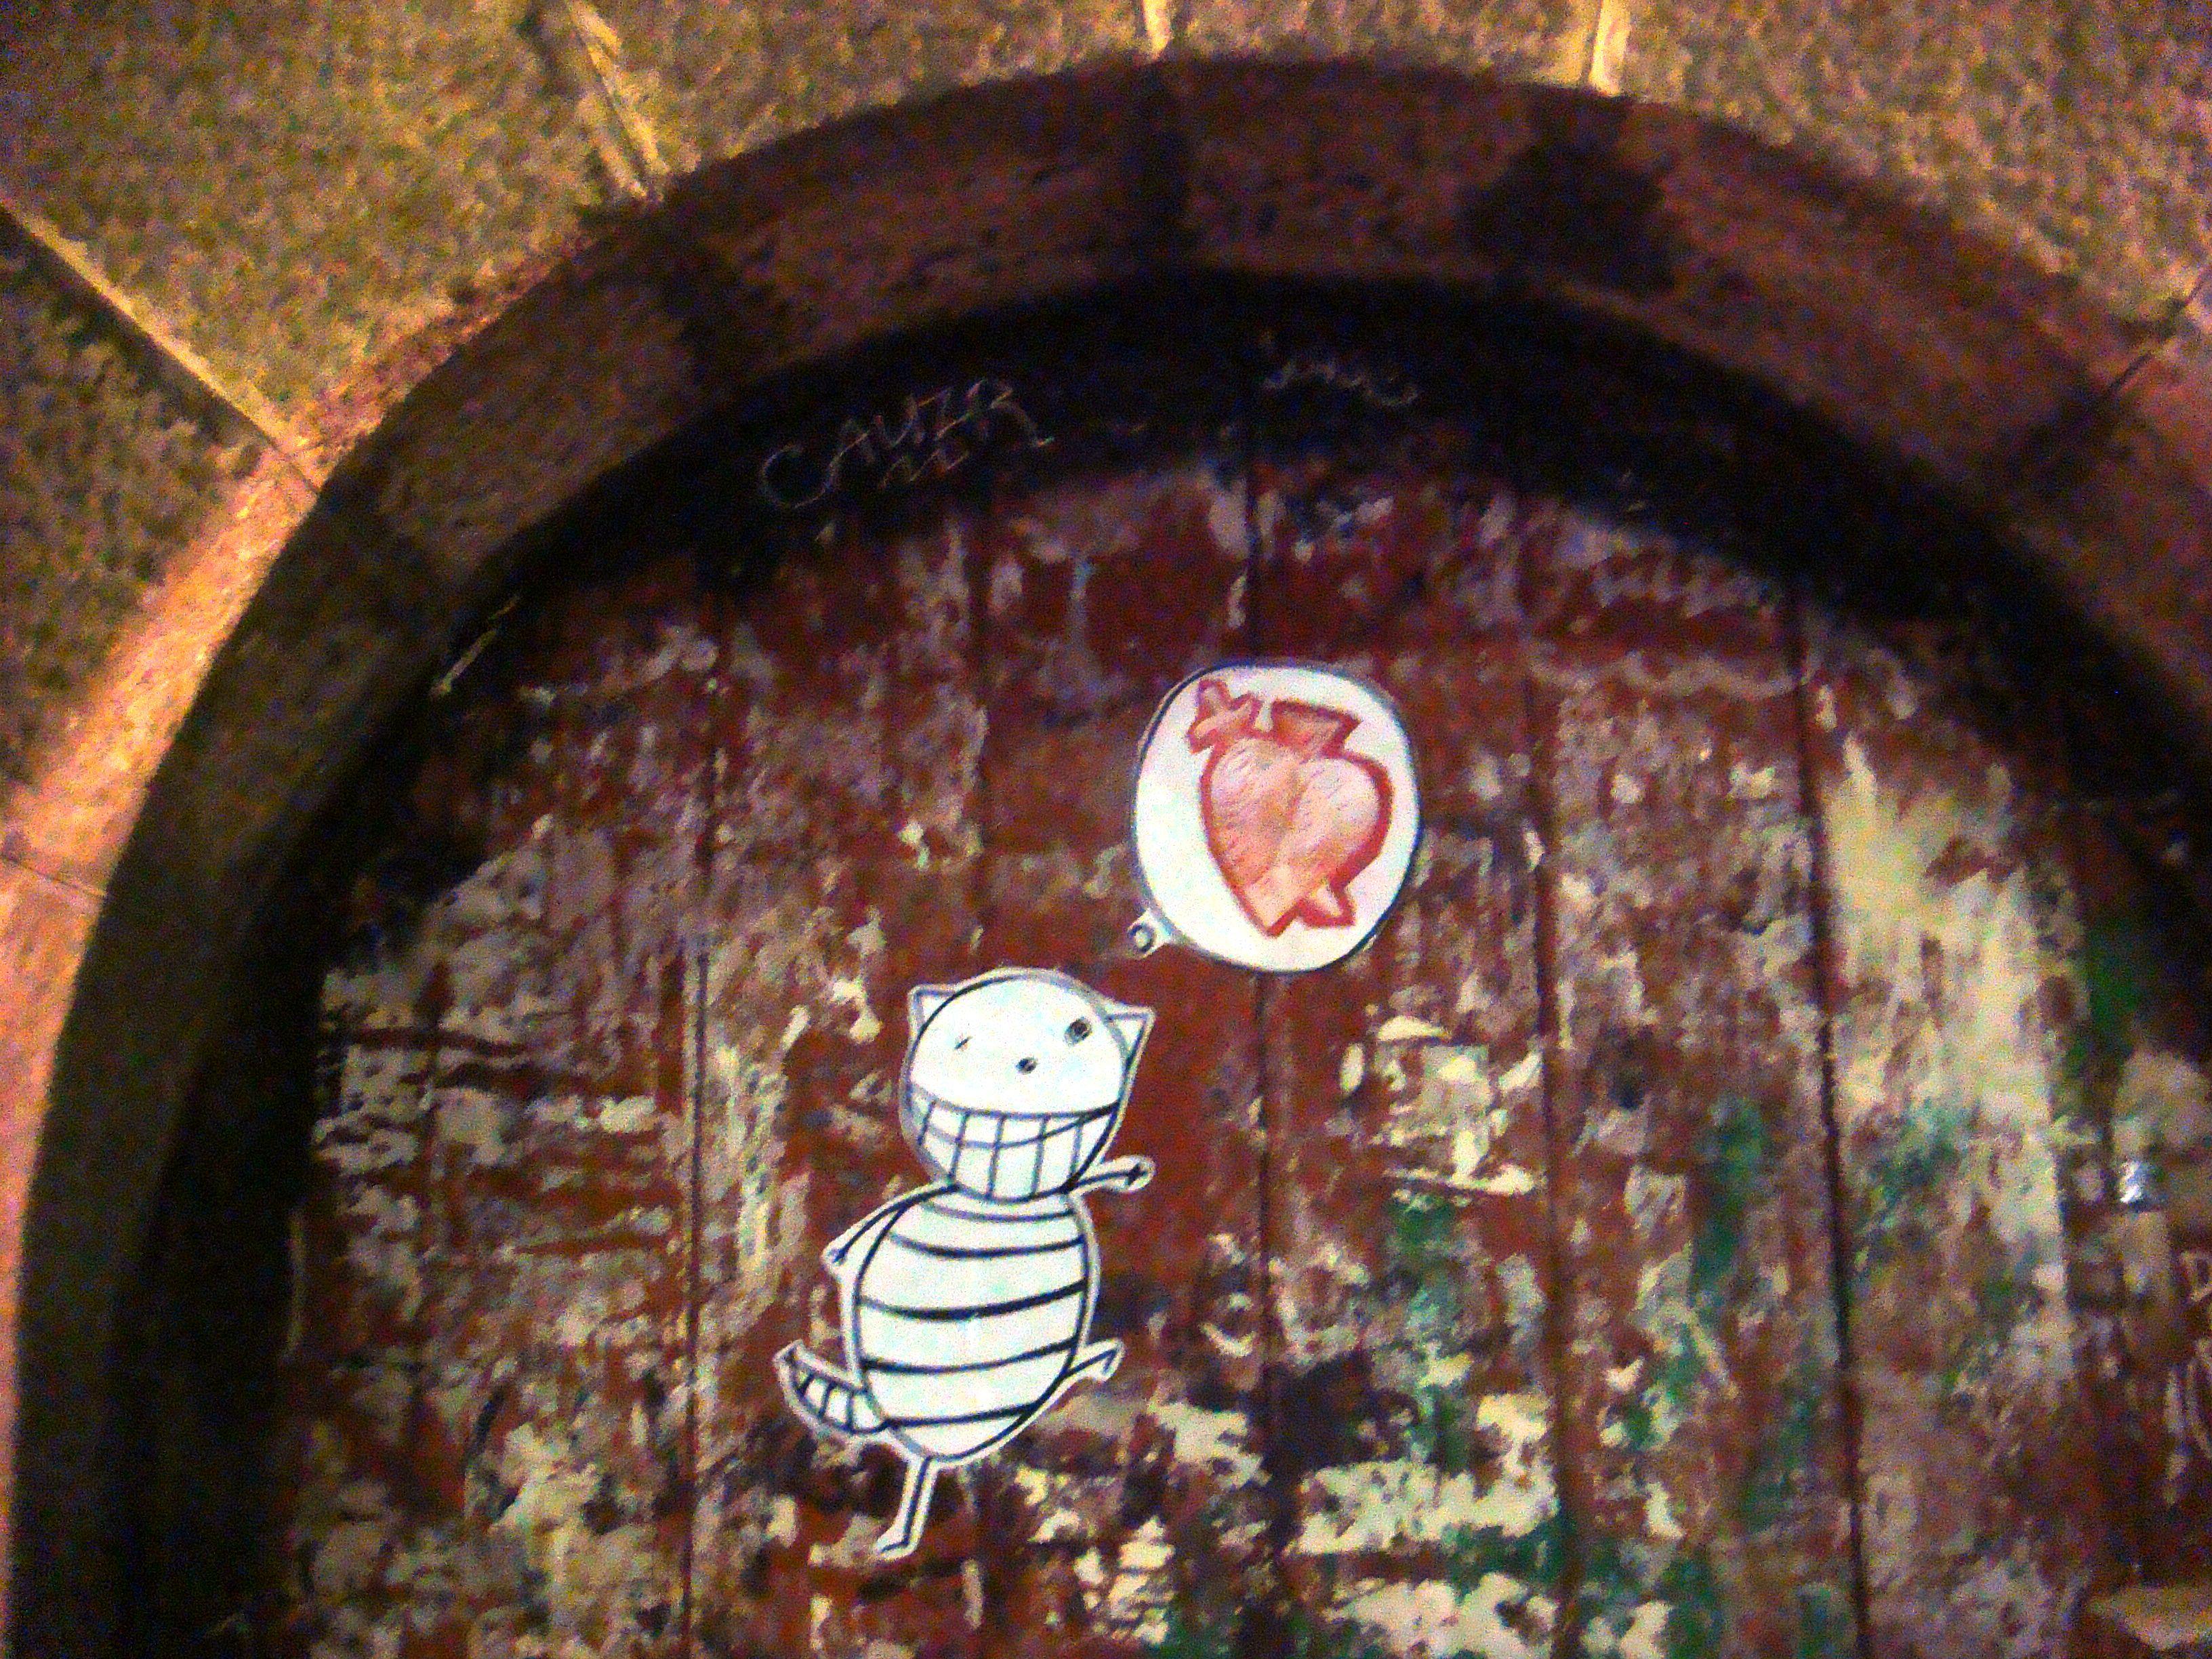 #penelopemaldonado #felixfellini #streetart #cats #gatos #streetartbarcelona #barcelona #artecallejero #arteurbano #arteurbana